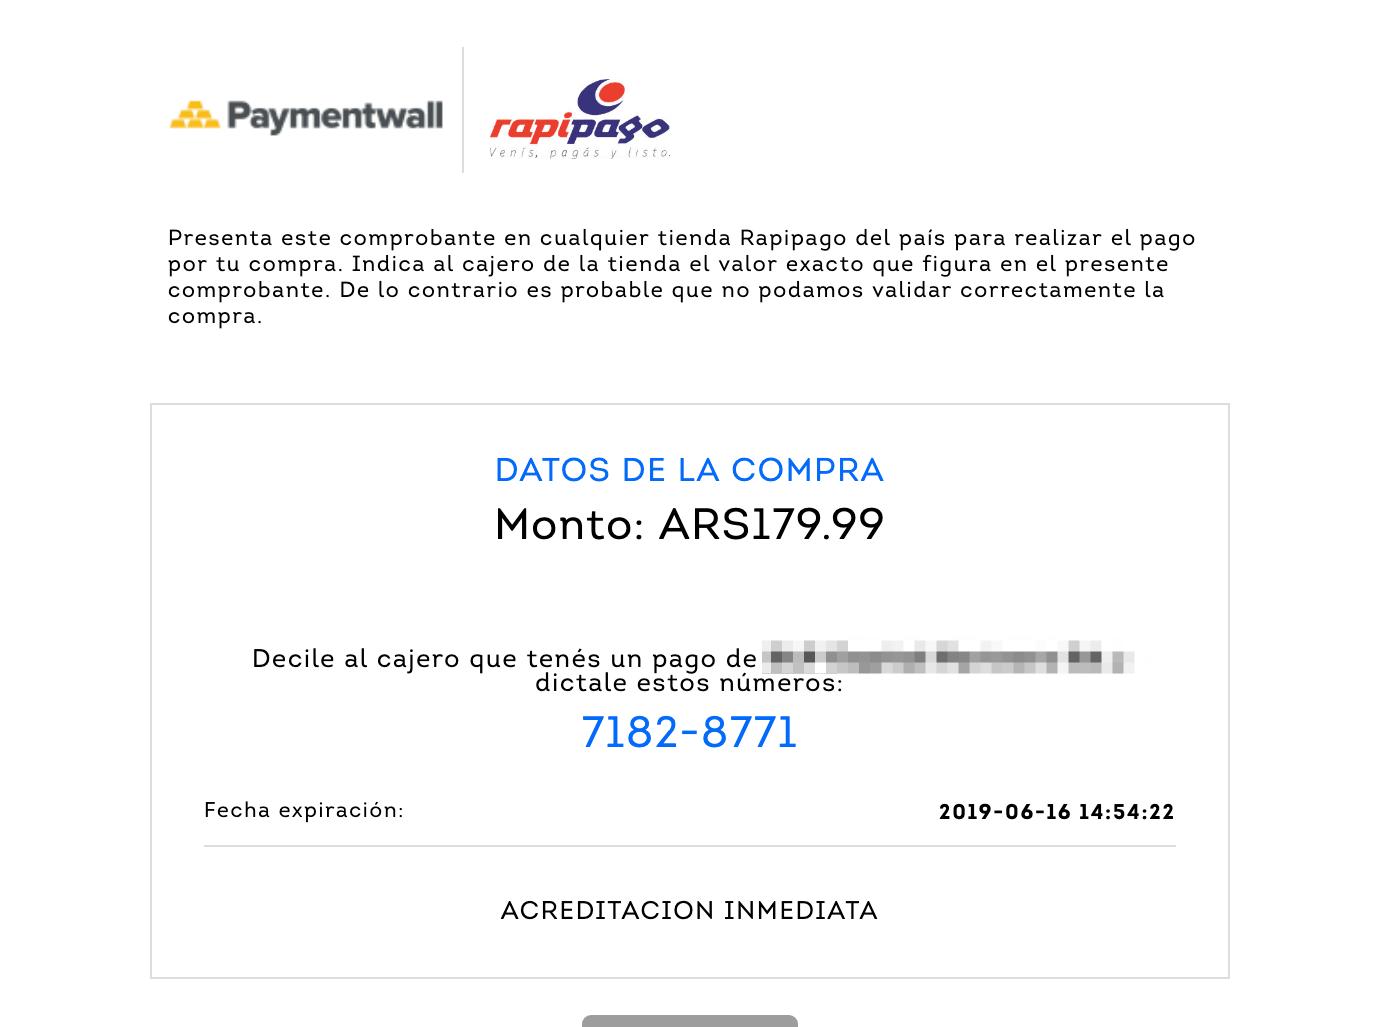 Rapipago invoice